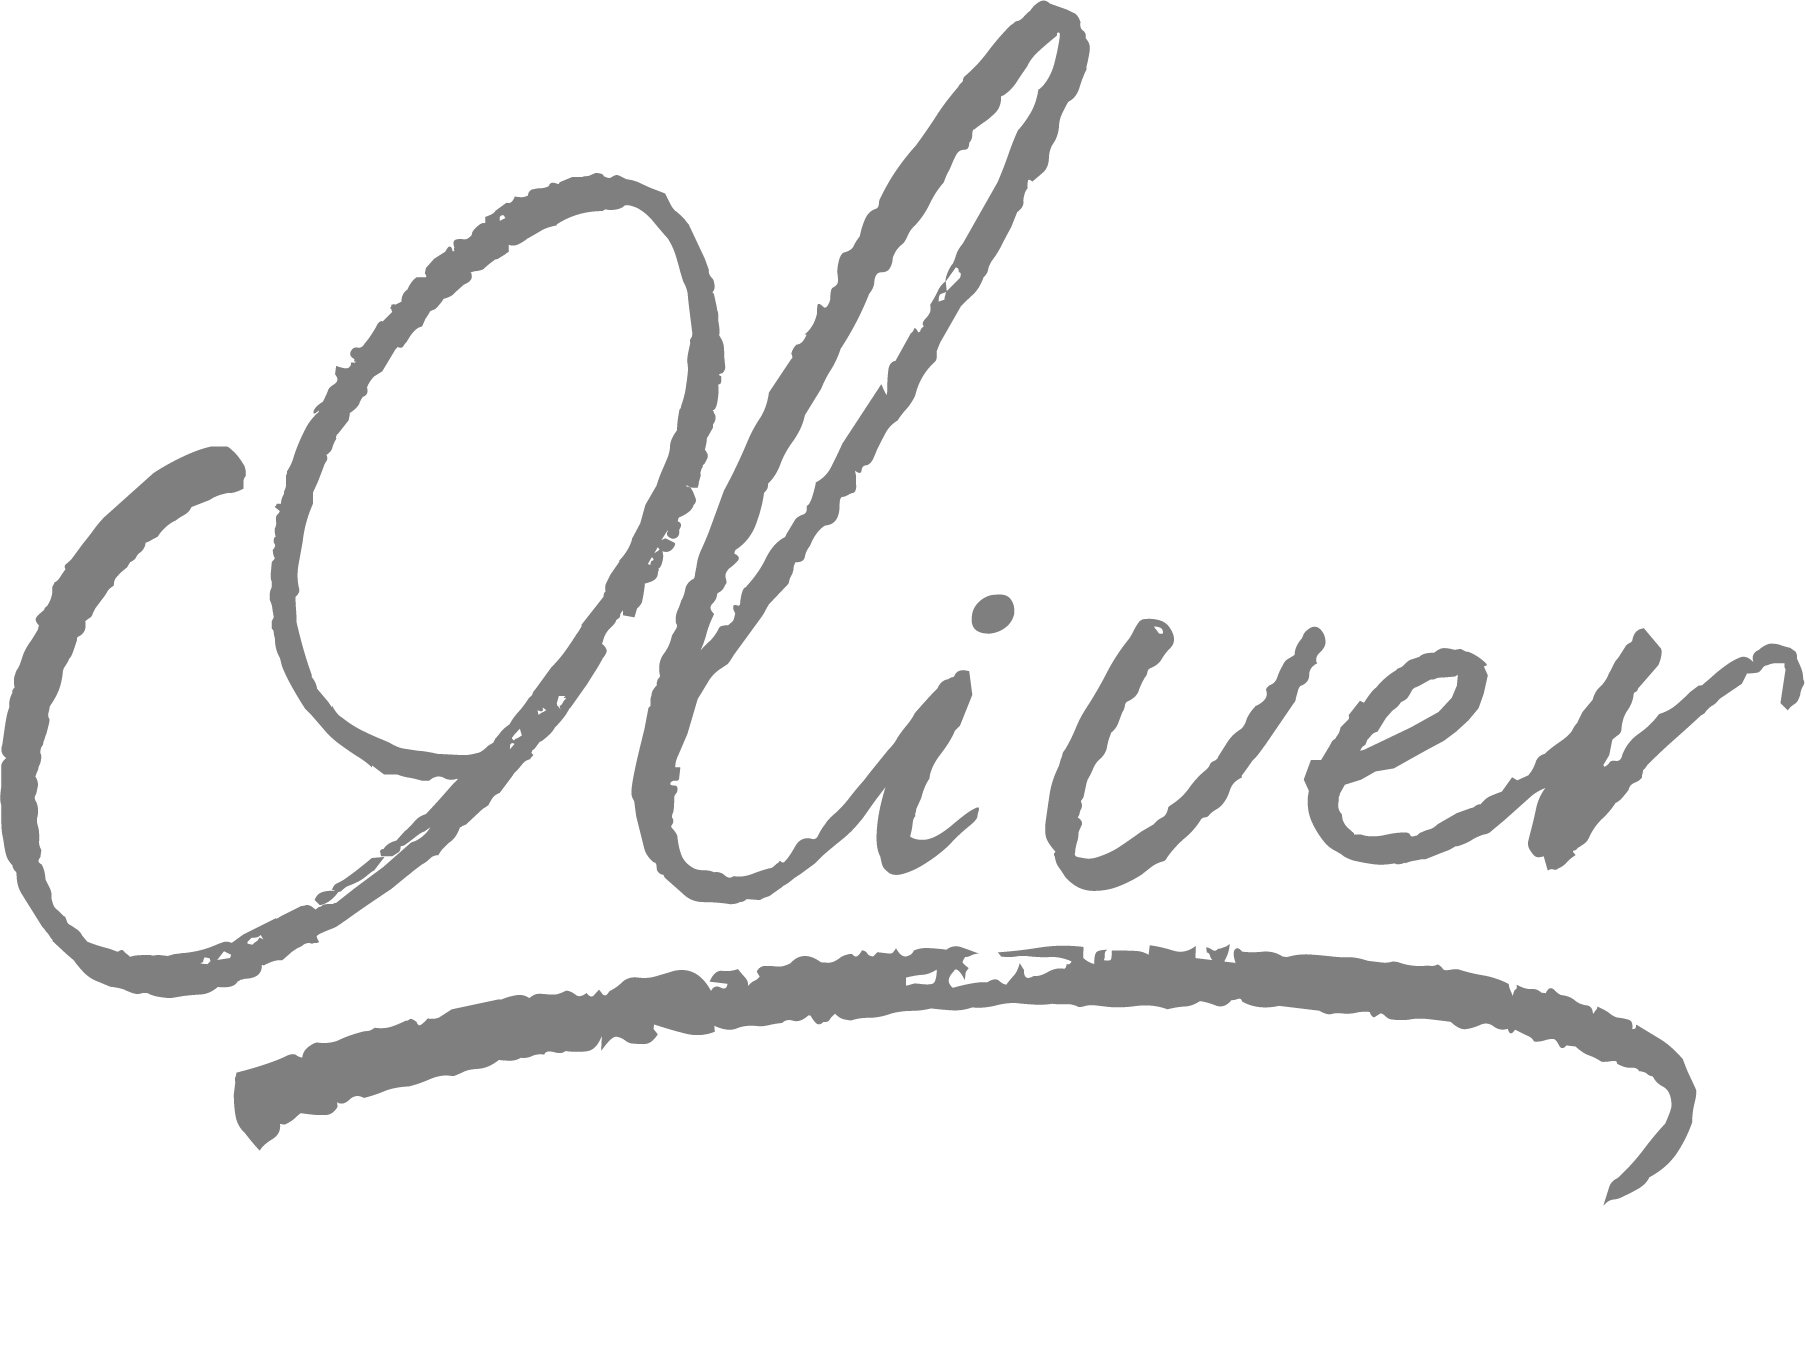 Artstudio Oliver